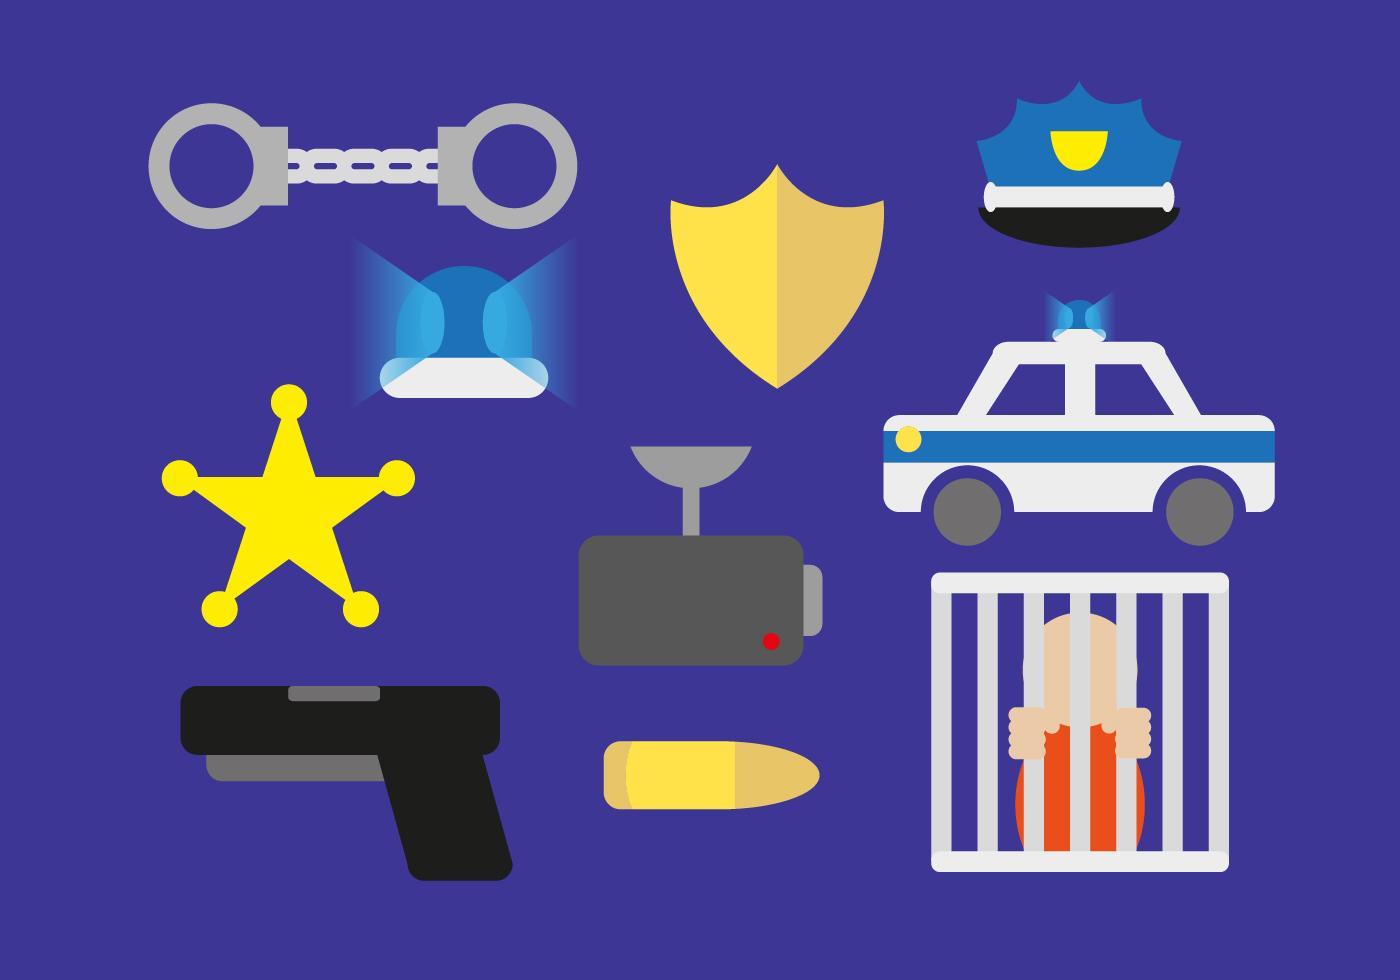 Police Illustration Elements Download Free Vectors